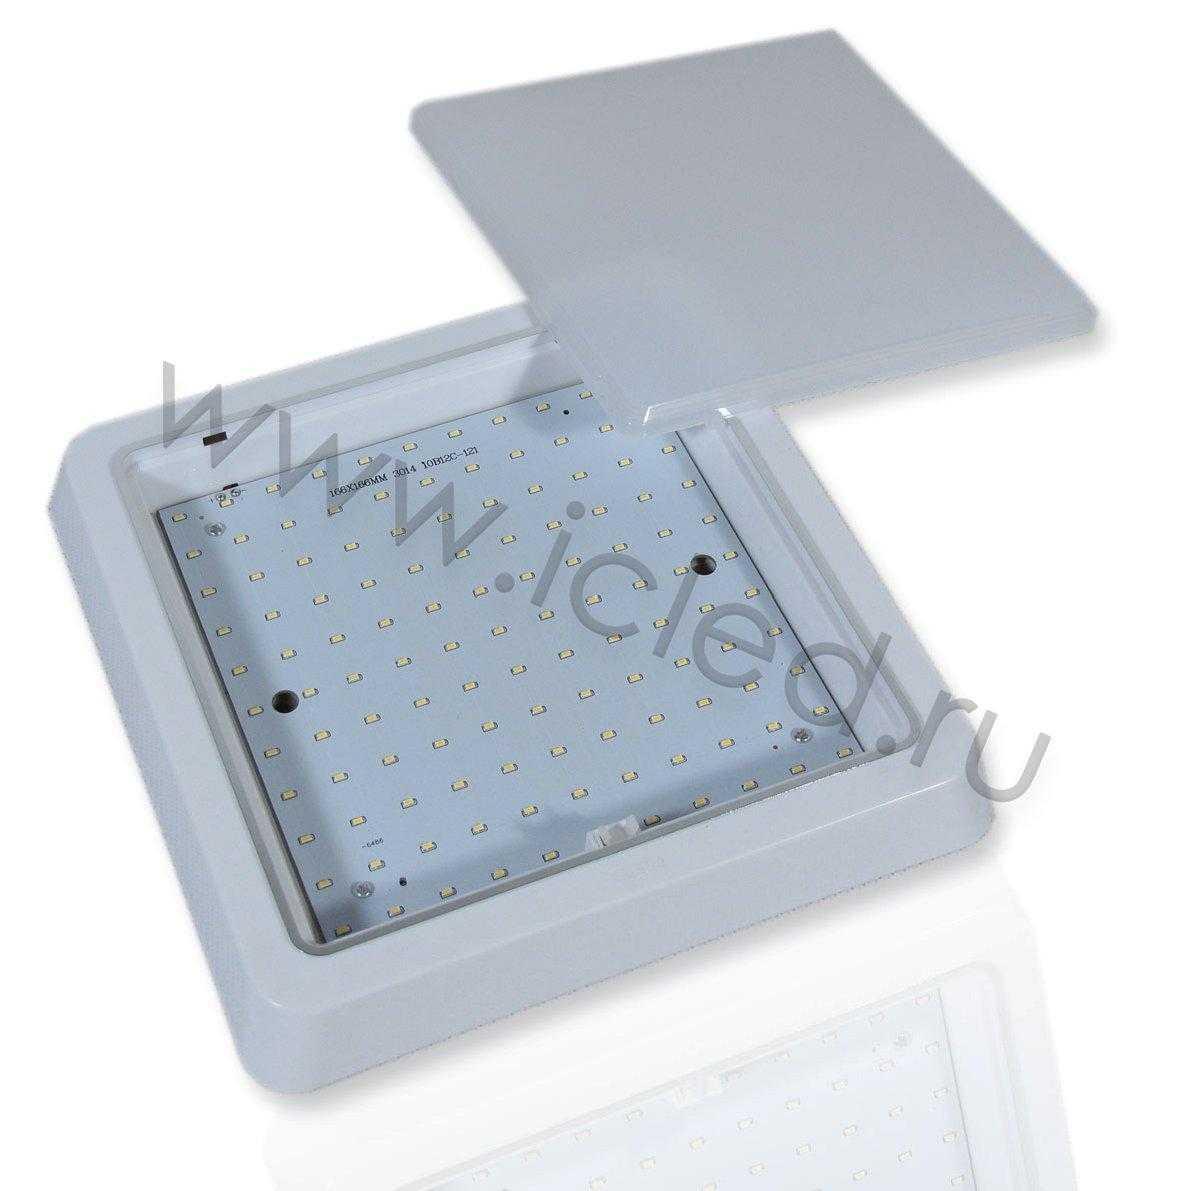 Светодиодный светильник MR-SW L270 (16W, Day White)